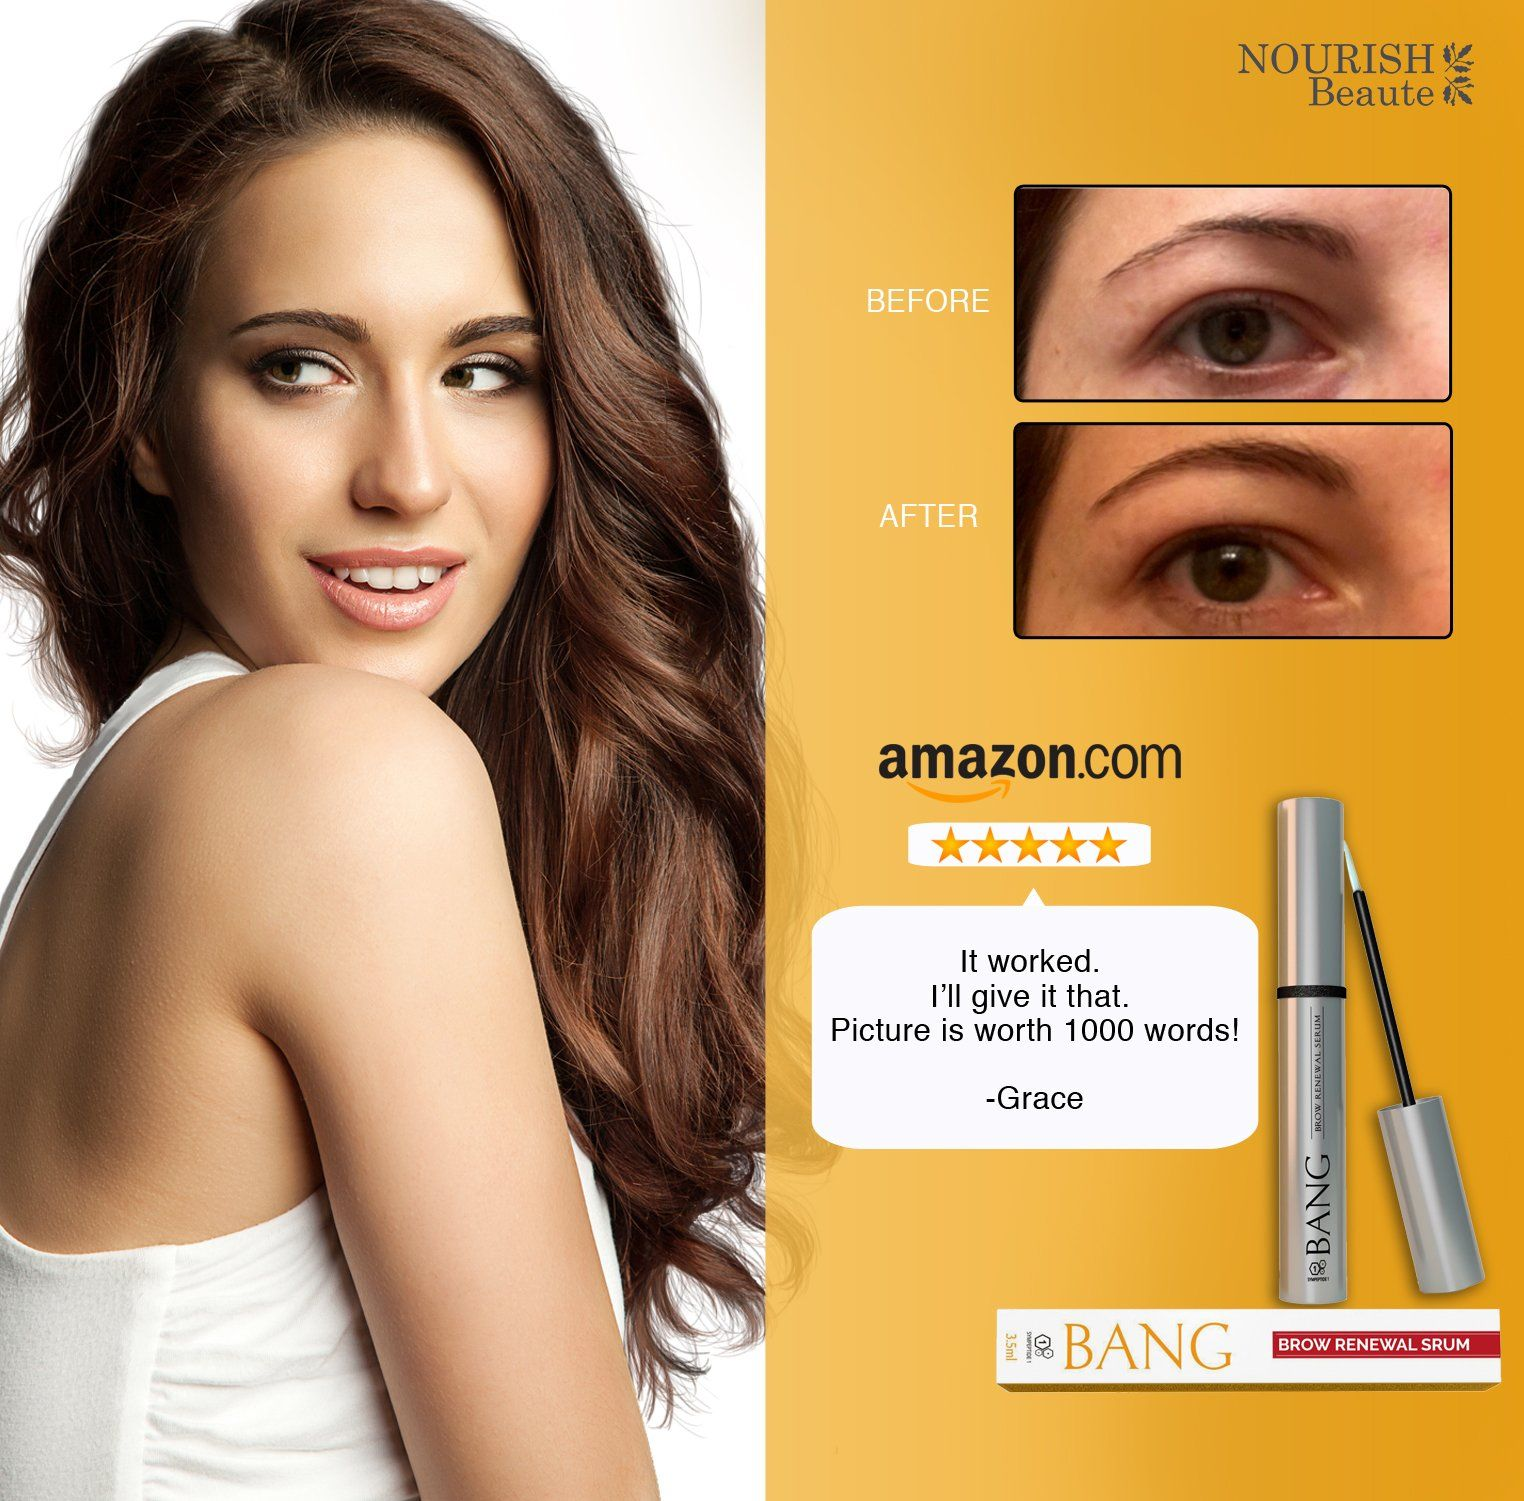 8bfb16410f5 Eyebrow Growth Serum – Get Perfect Bolder Brows w/ Organic Argan Oil  Castor Oil #MakeupForWomenIdeas